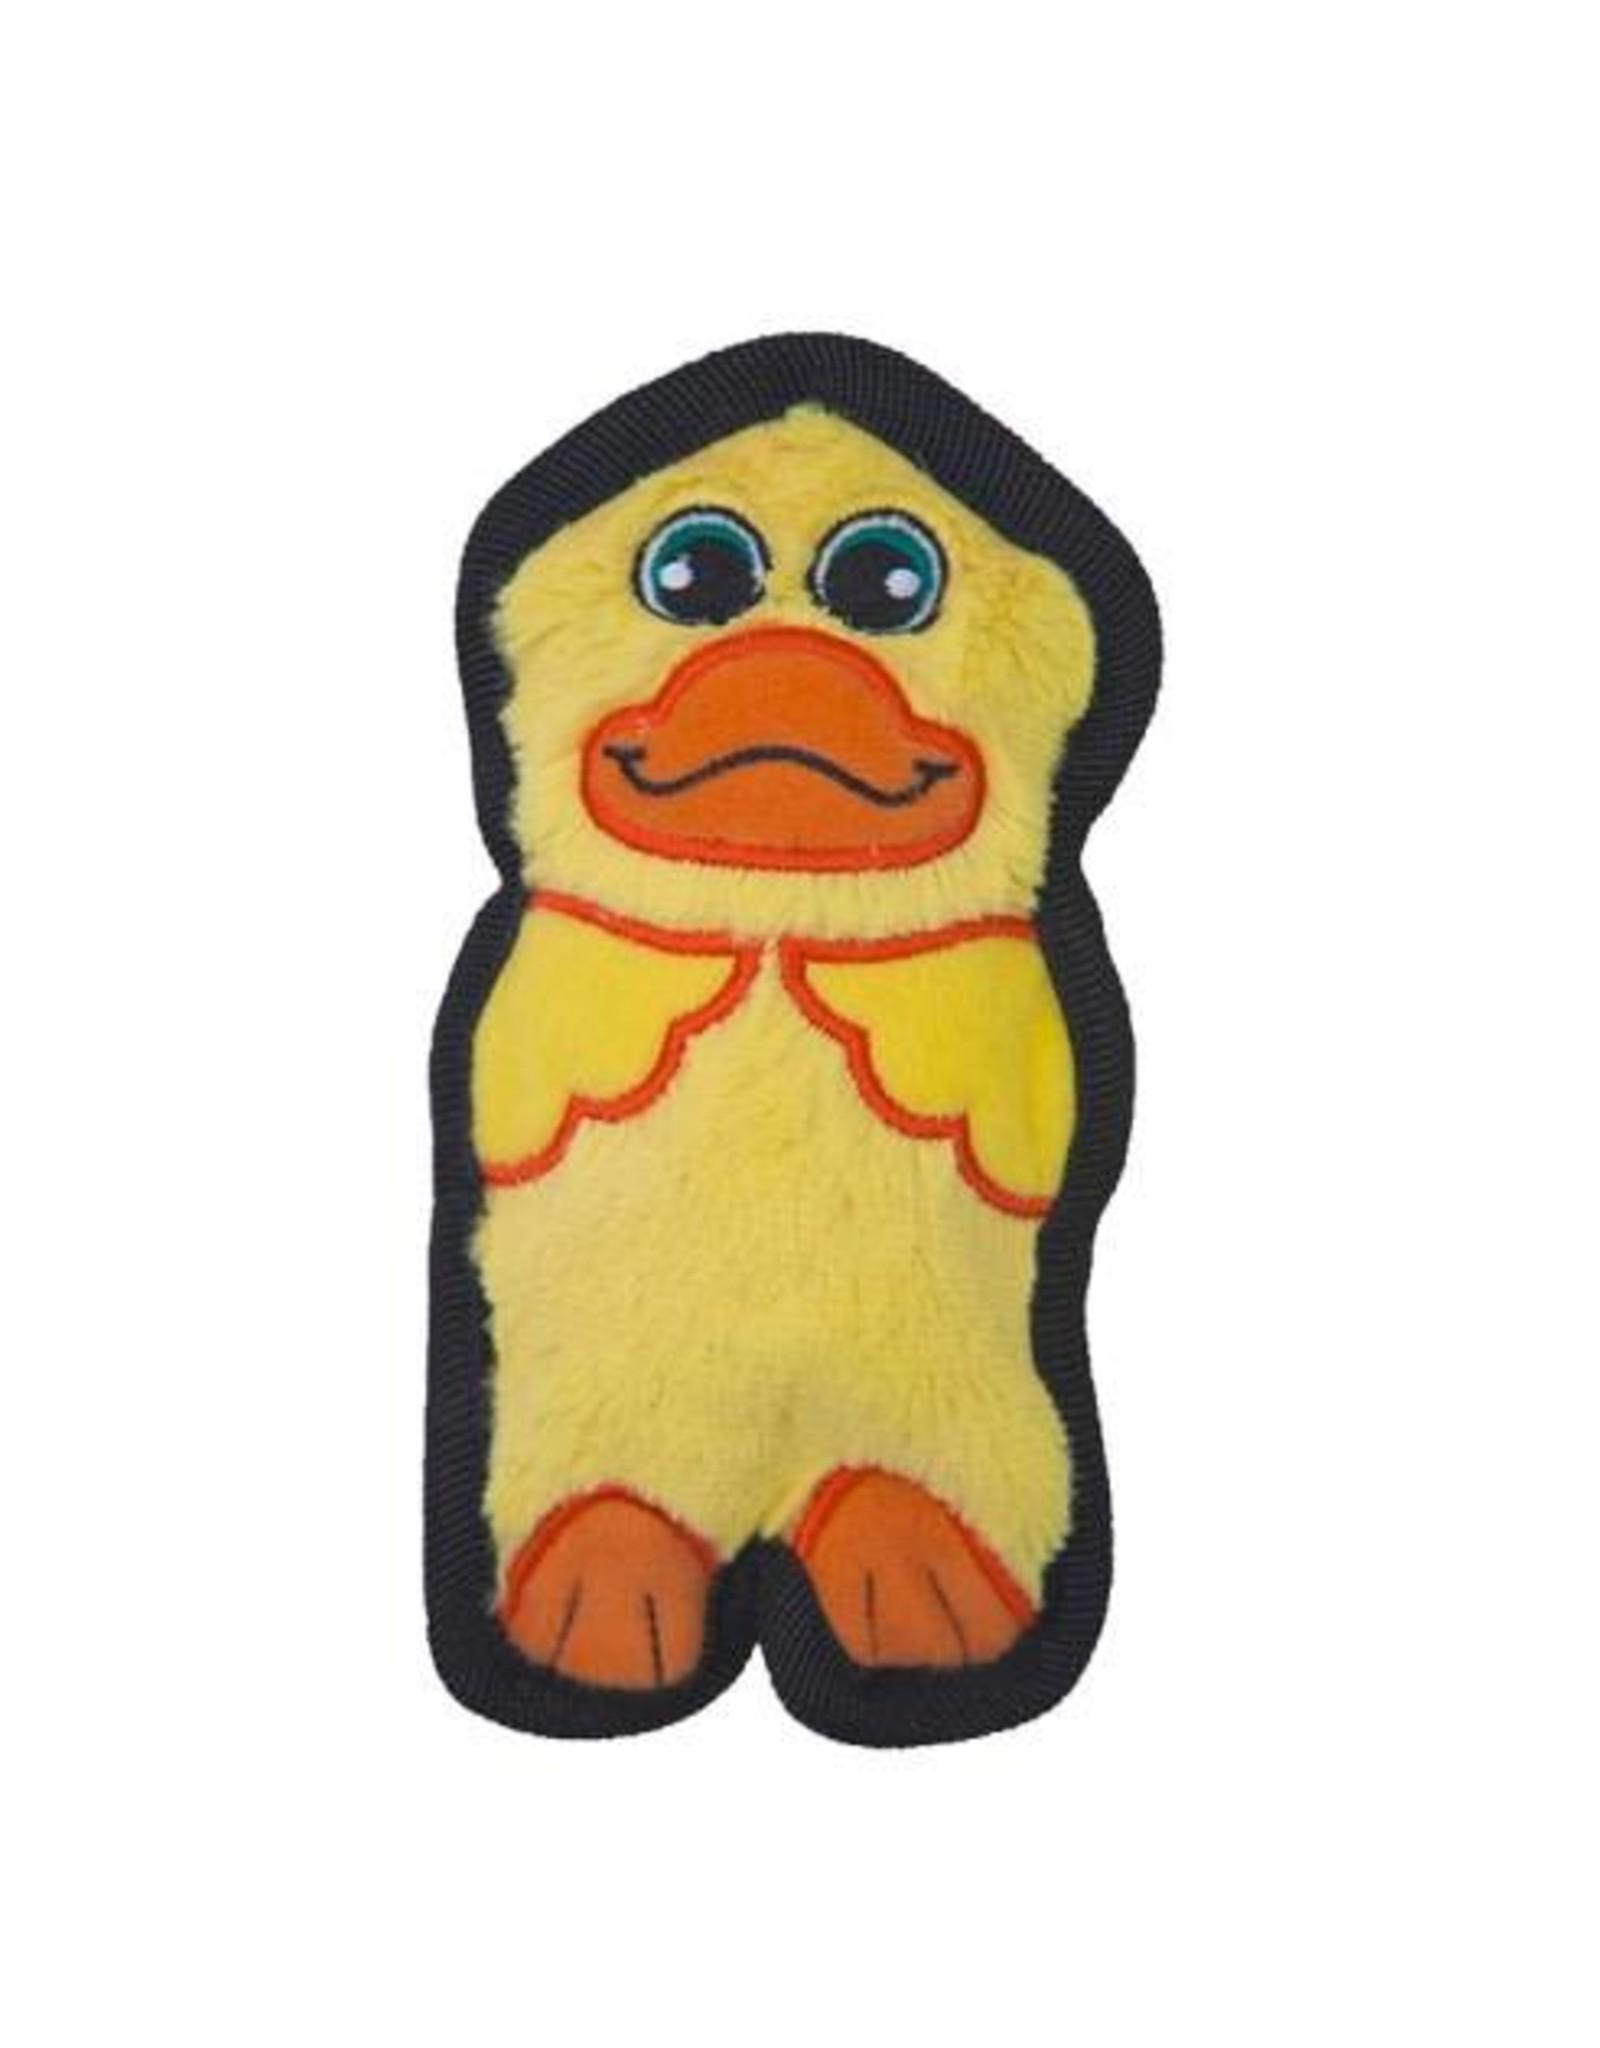 Outward Hound Outward Hound Invincibles Mini Ducky